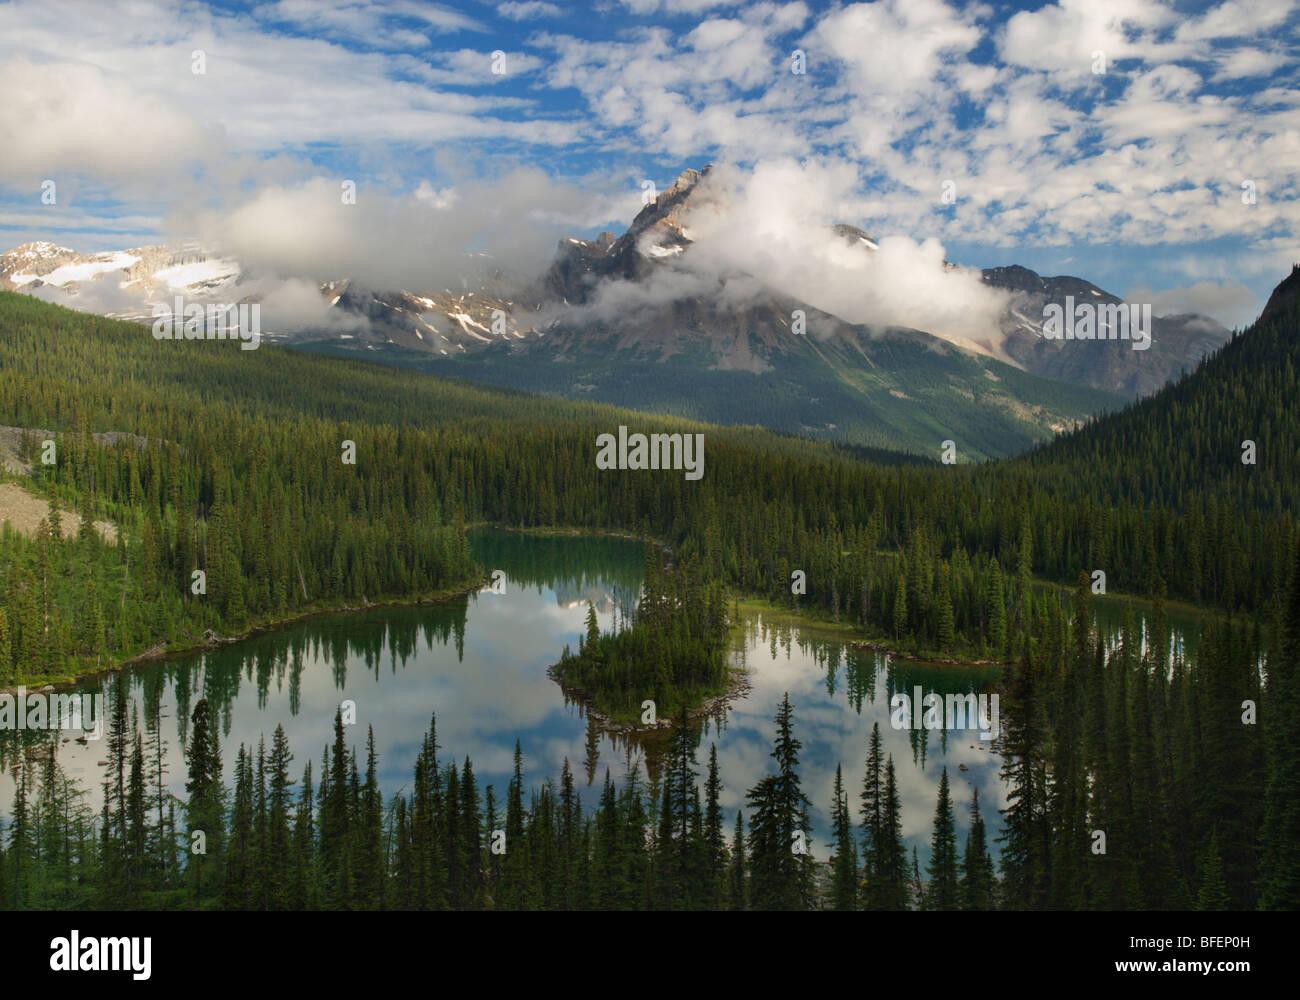 Cathedral Mountain, Morning Glory Lake, Lake O'Hara, Yoho National Park, British Columbia, Canada - Stock Image